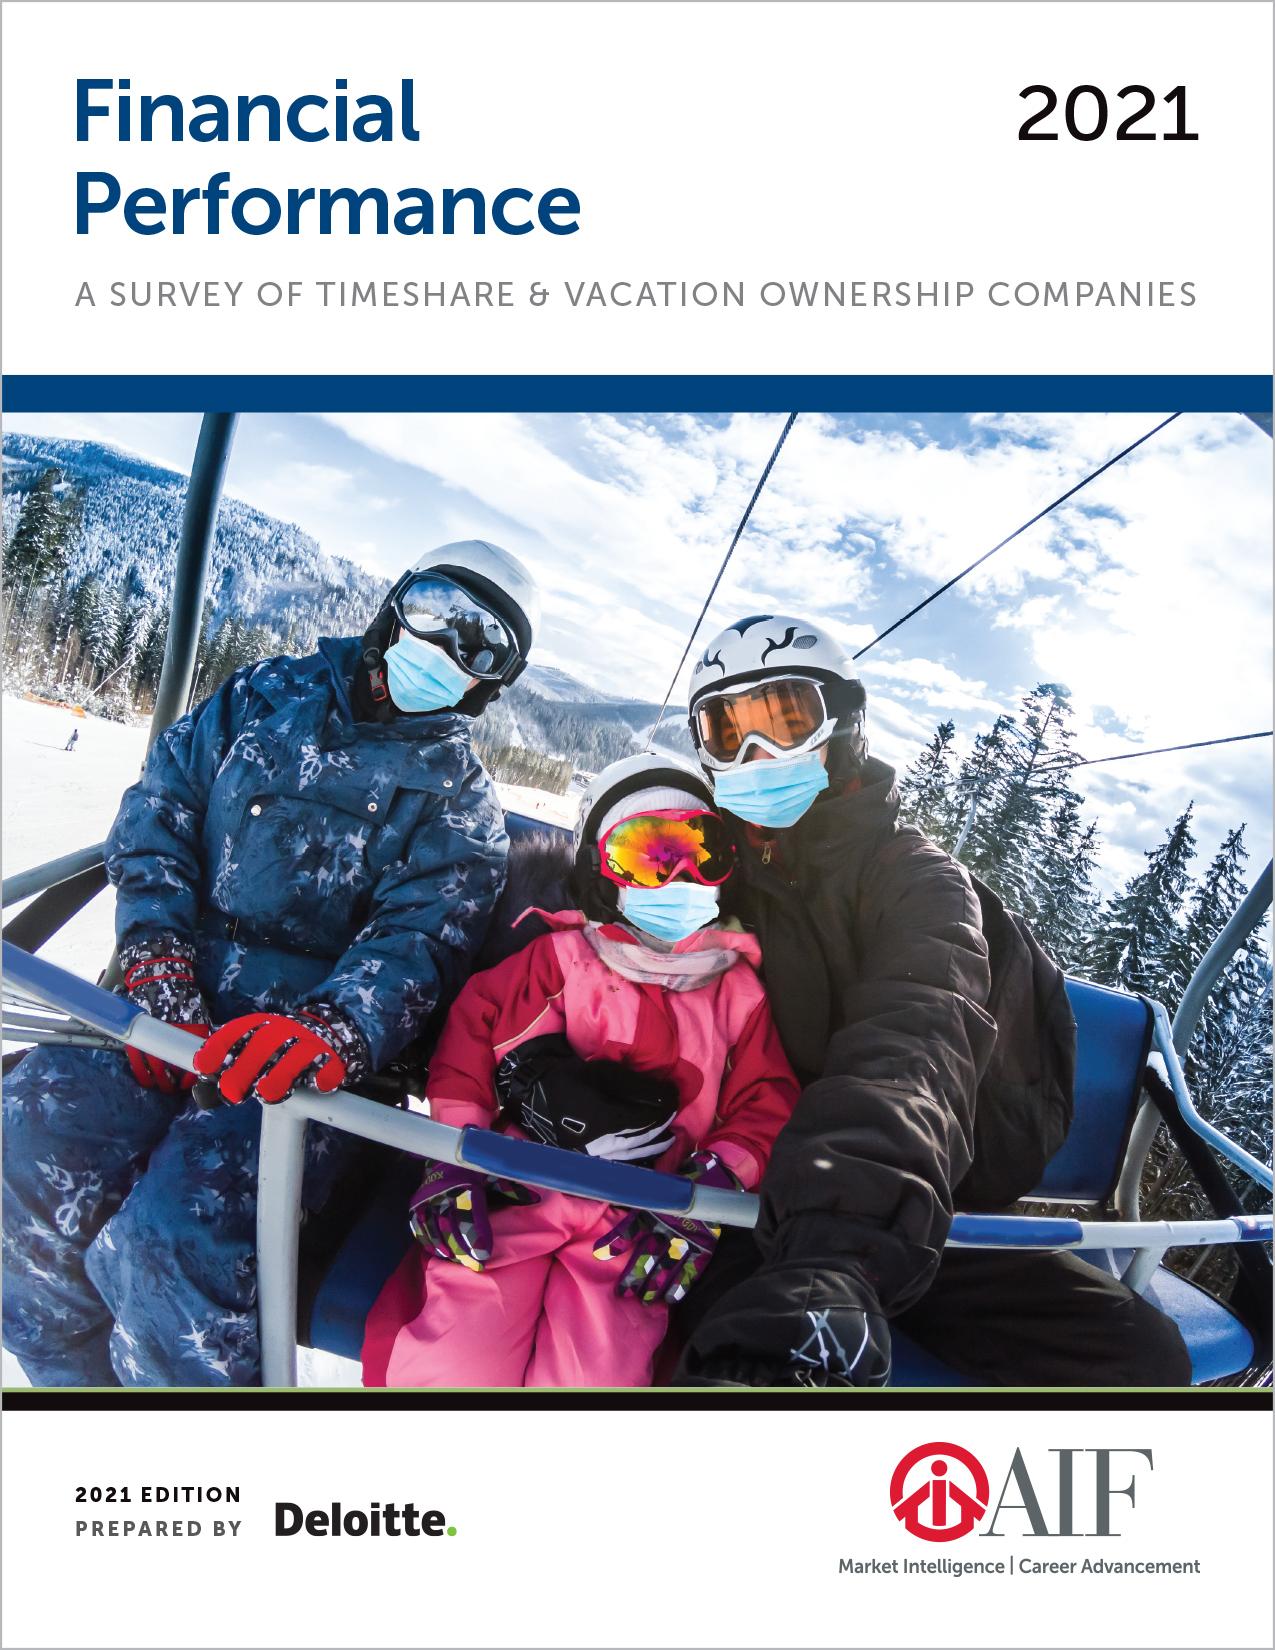 Financial Performance, 2021 Ed. Full Report